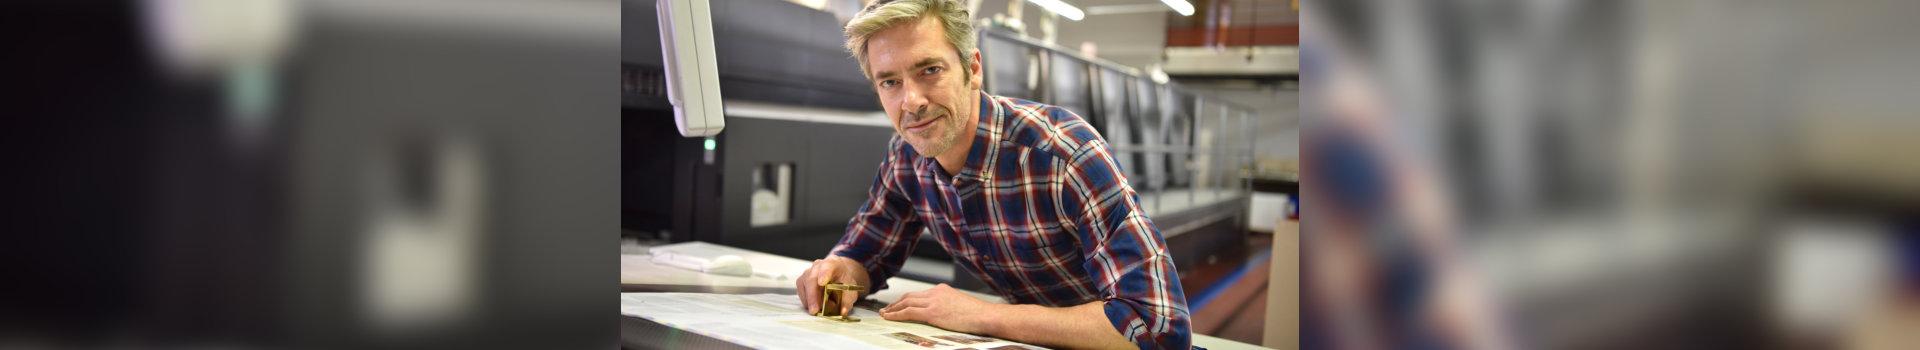 Man working in printing industry